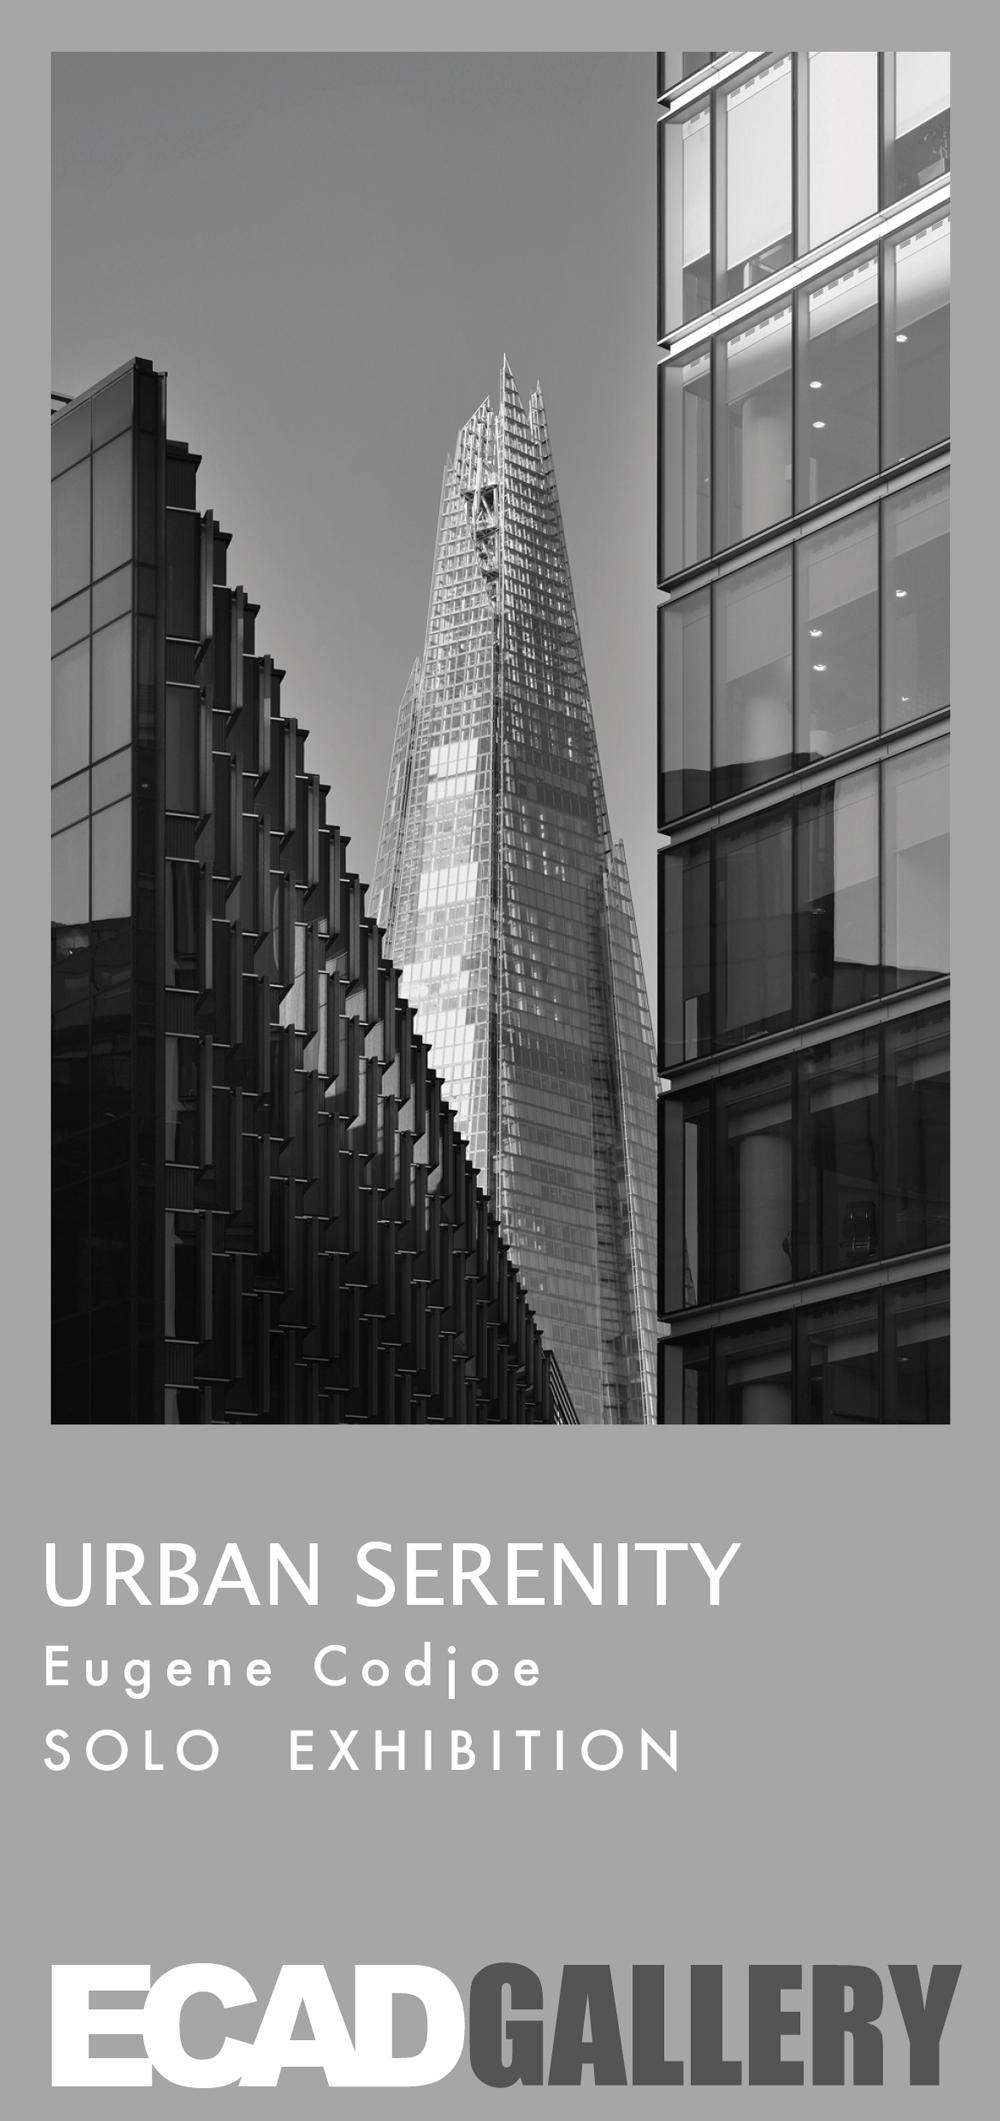 Eugene Codjoe | Dec 6 - Dec 31 - ECAD Photography (Eugene Ofolie Codjoe) presents an abstraction of stylish architecture designed to evoke contemplation and a serenity of light & shadow.